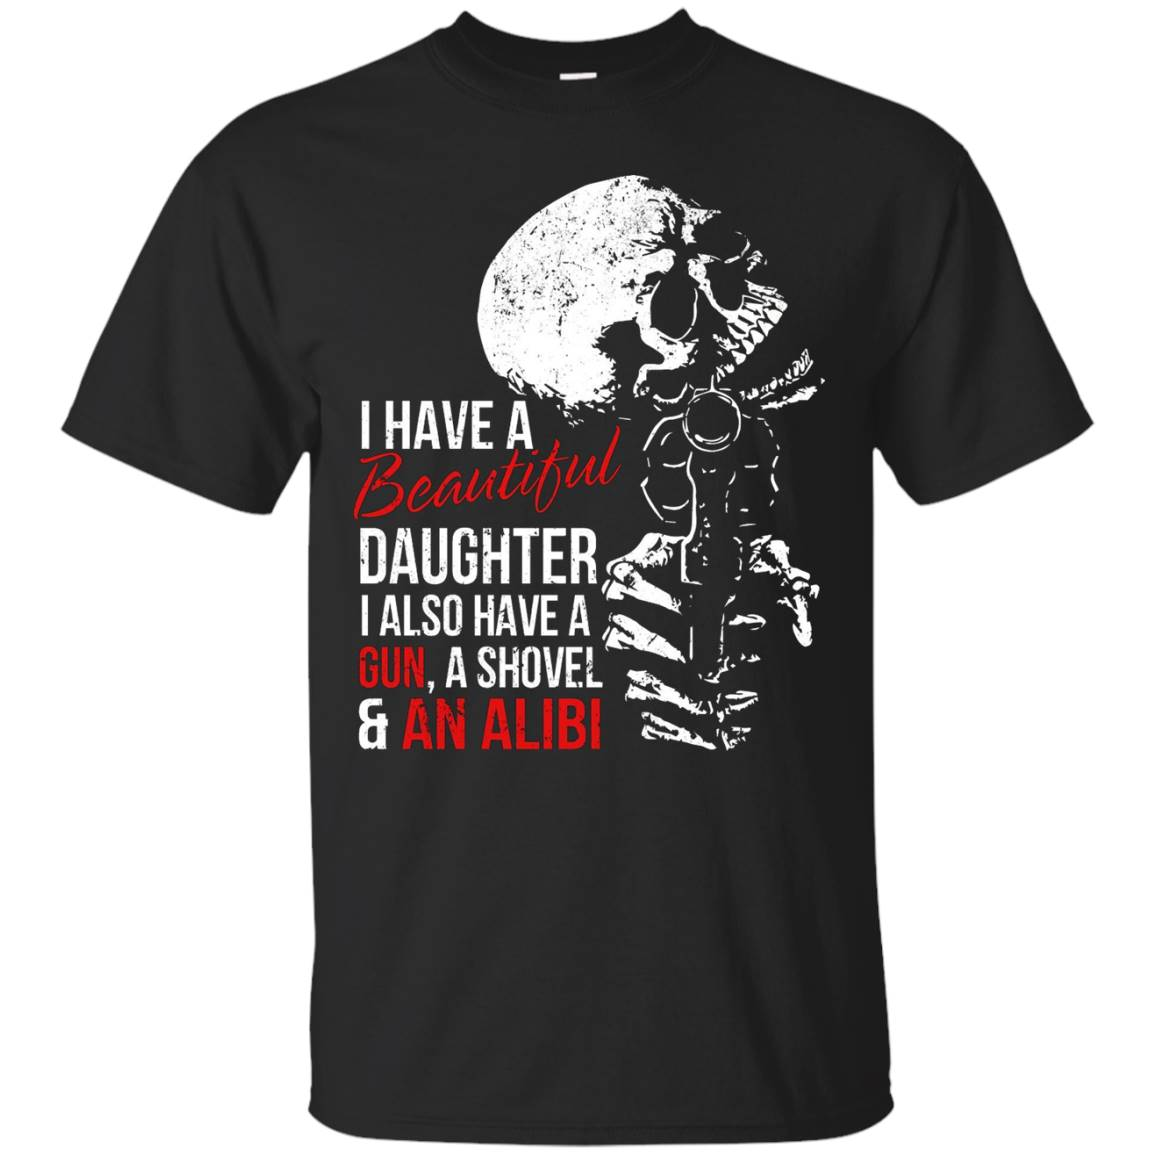 I Have A Beautiful Daughter t-shirt Gun, Shovel And Alibi